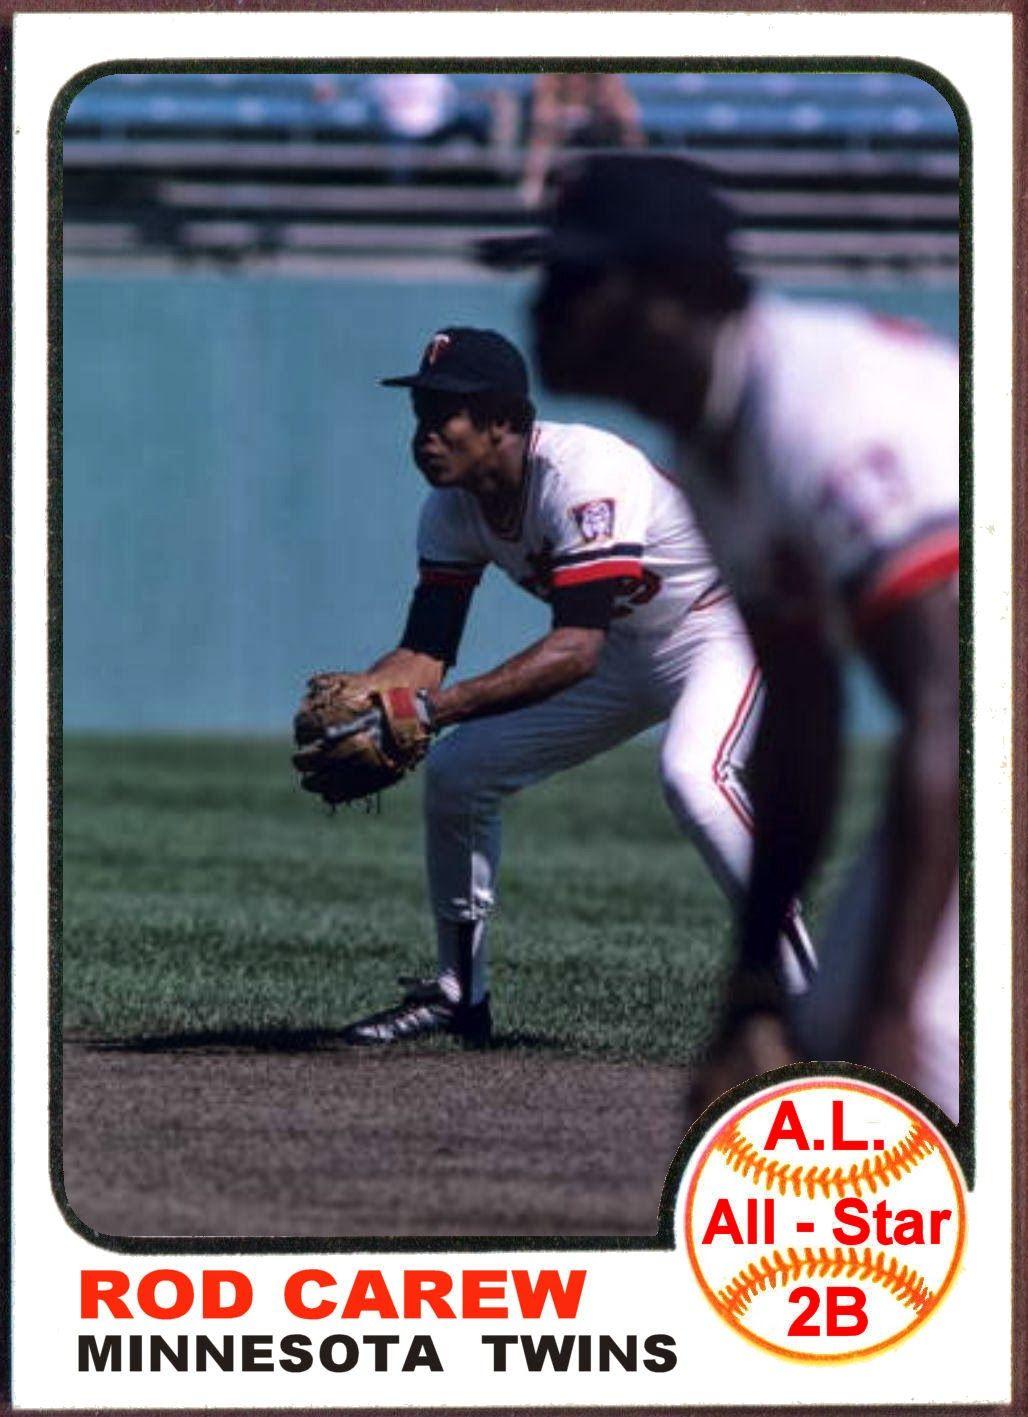 1973 Topps All Star Cards American League Infield Minnesota Twins Baseball Twins Baseball Mlb Baseball Players